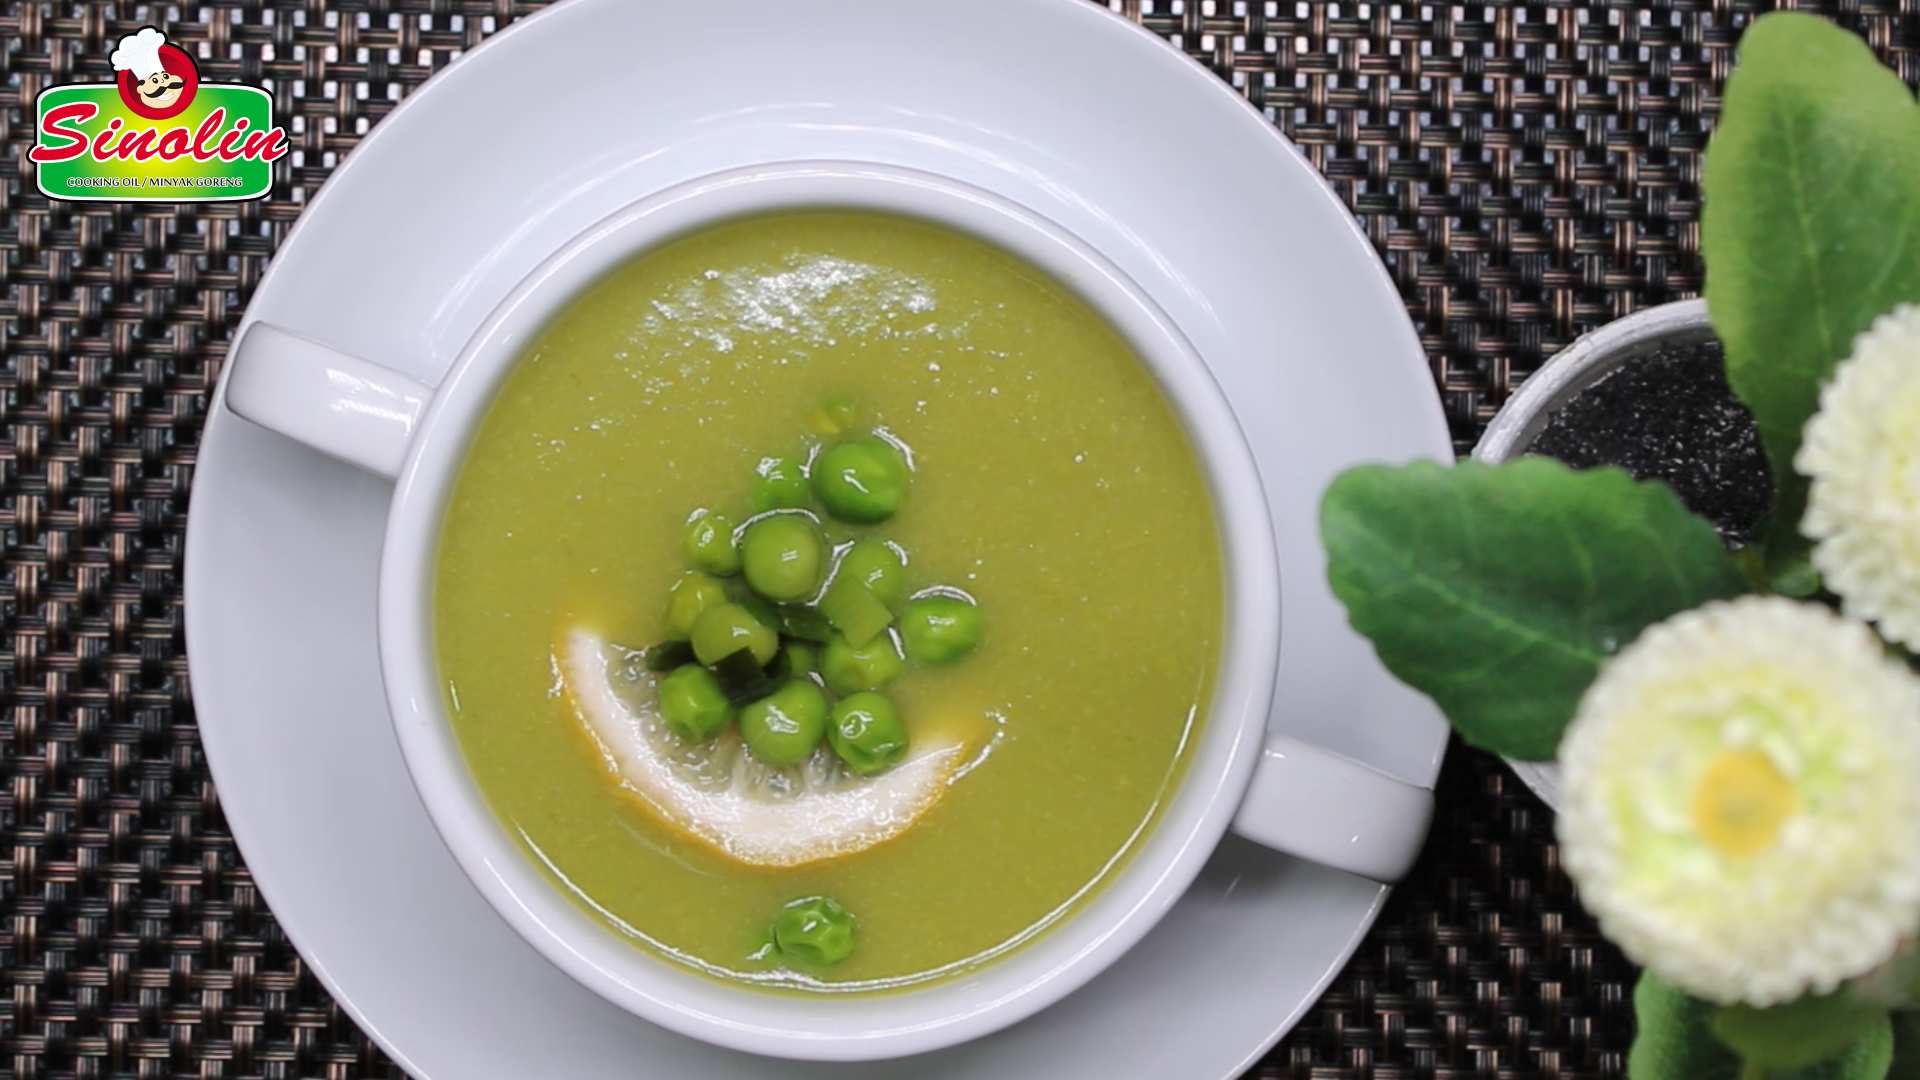 Dairy-free pea and leek soup By Dapur Sinolin